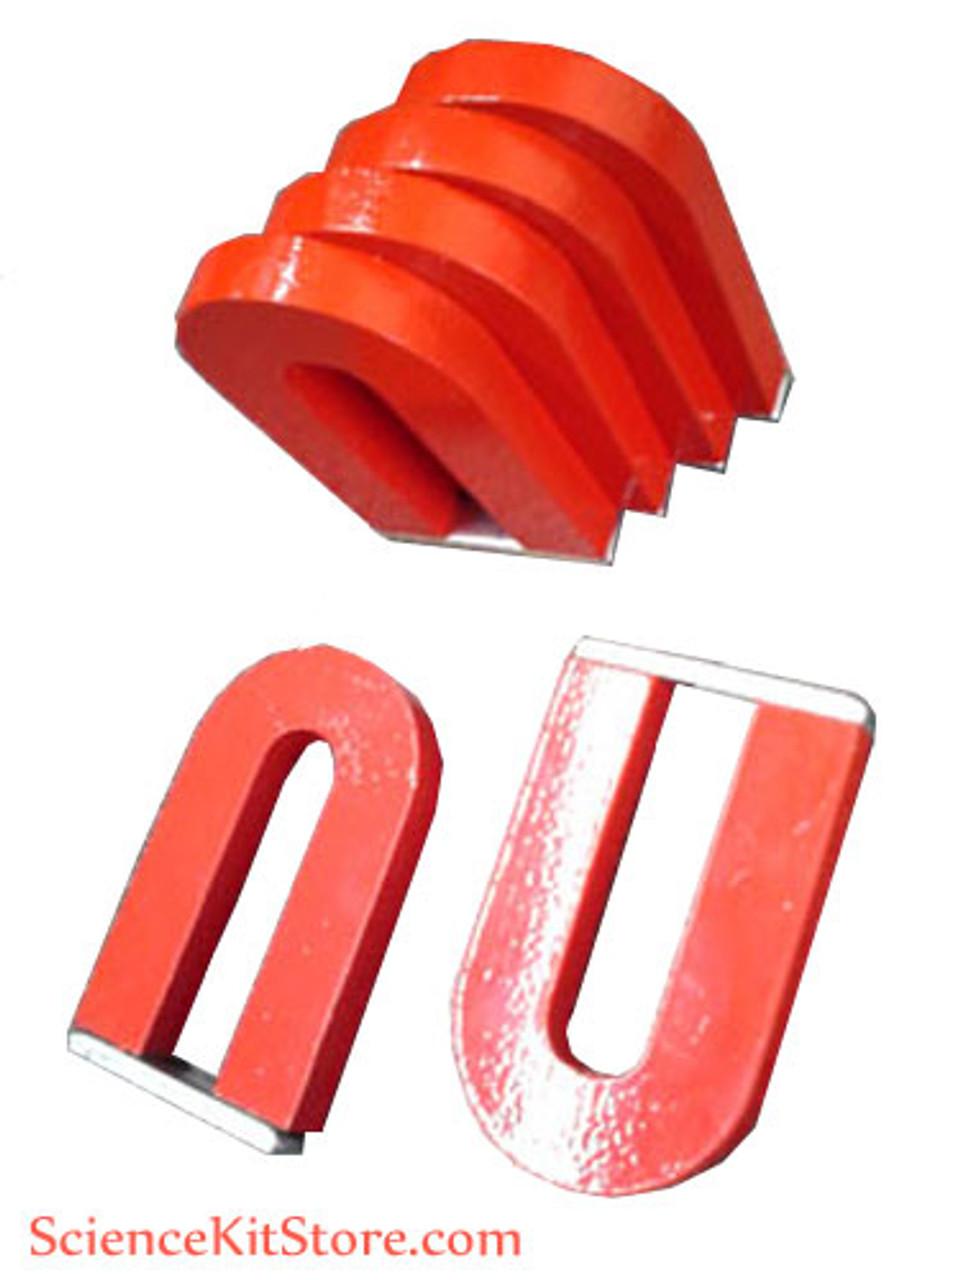 "ALNICO 2"" Horseshoe Magnet"